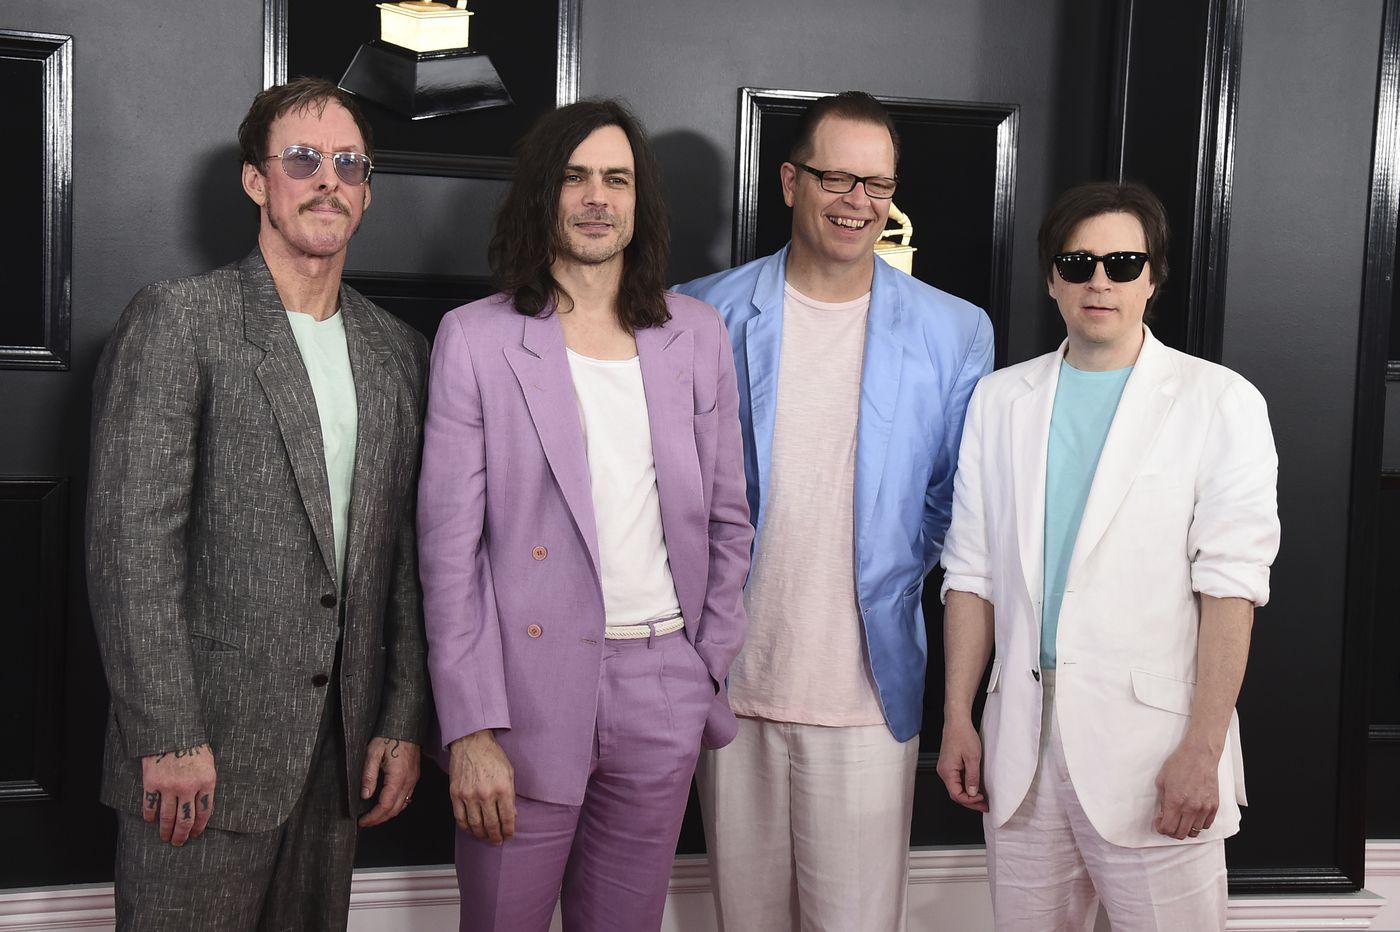 Album reviews: Weezer, Juice WRLD, Hayes Carll